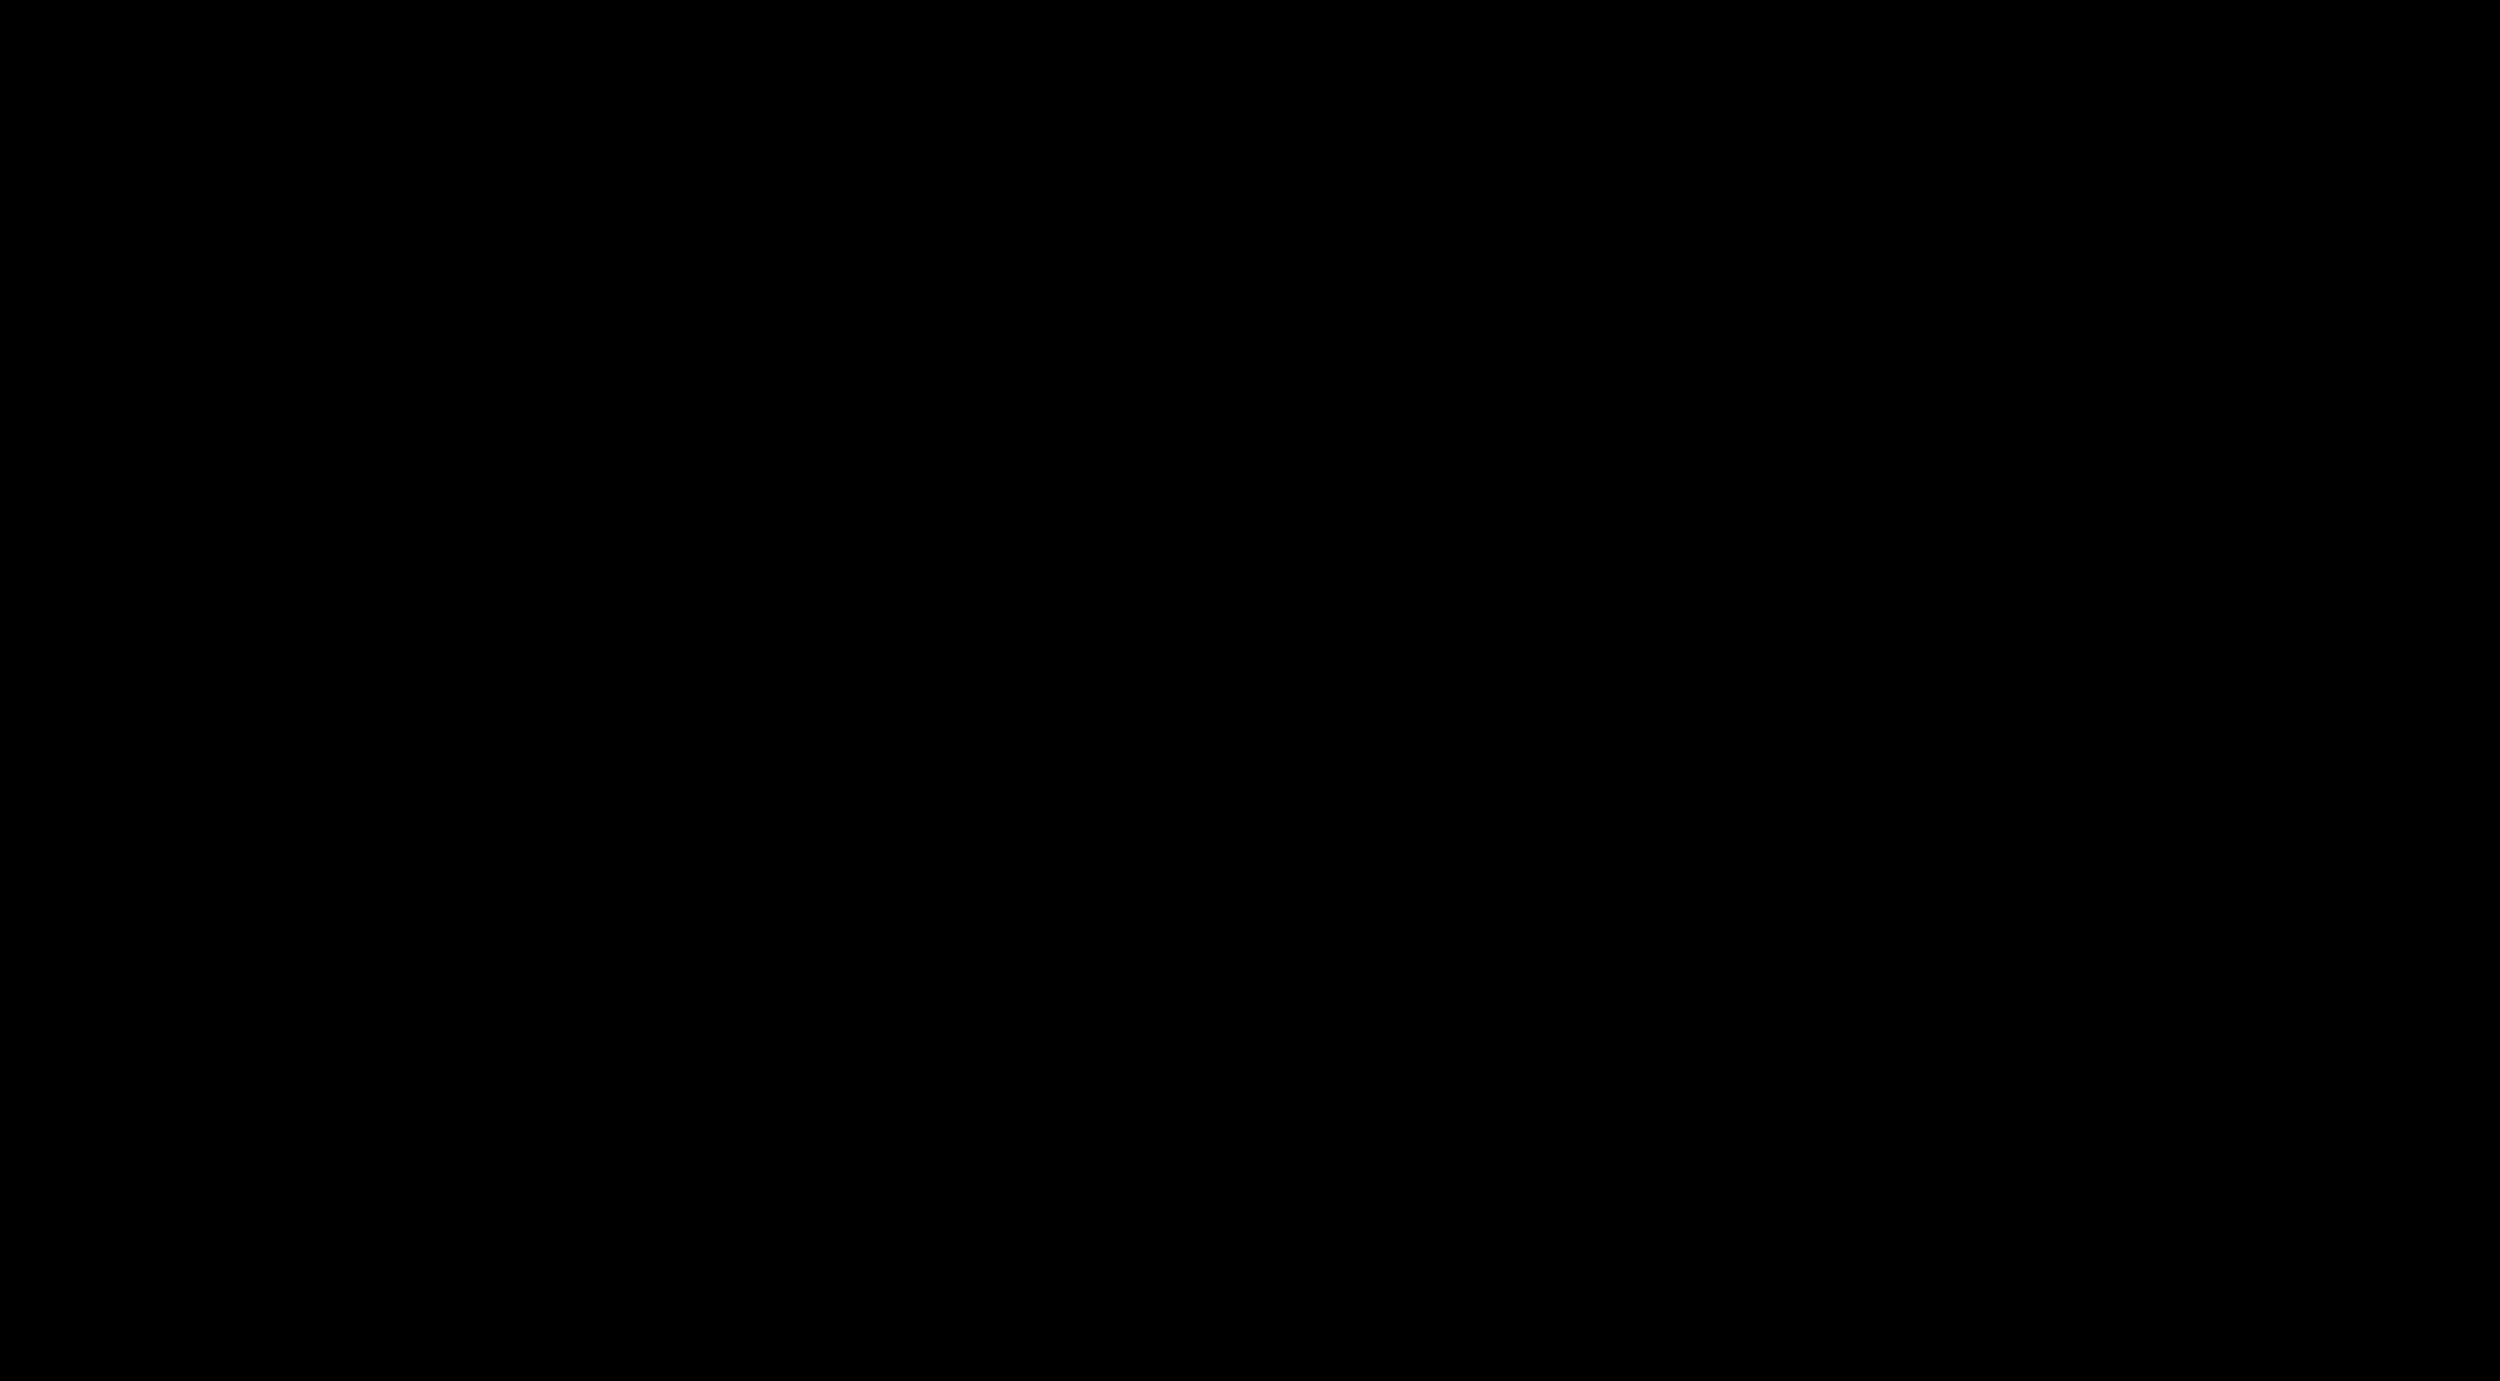 mshd-logo1.png